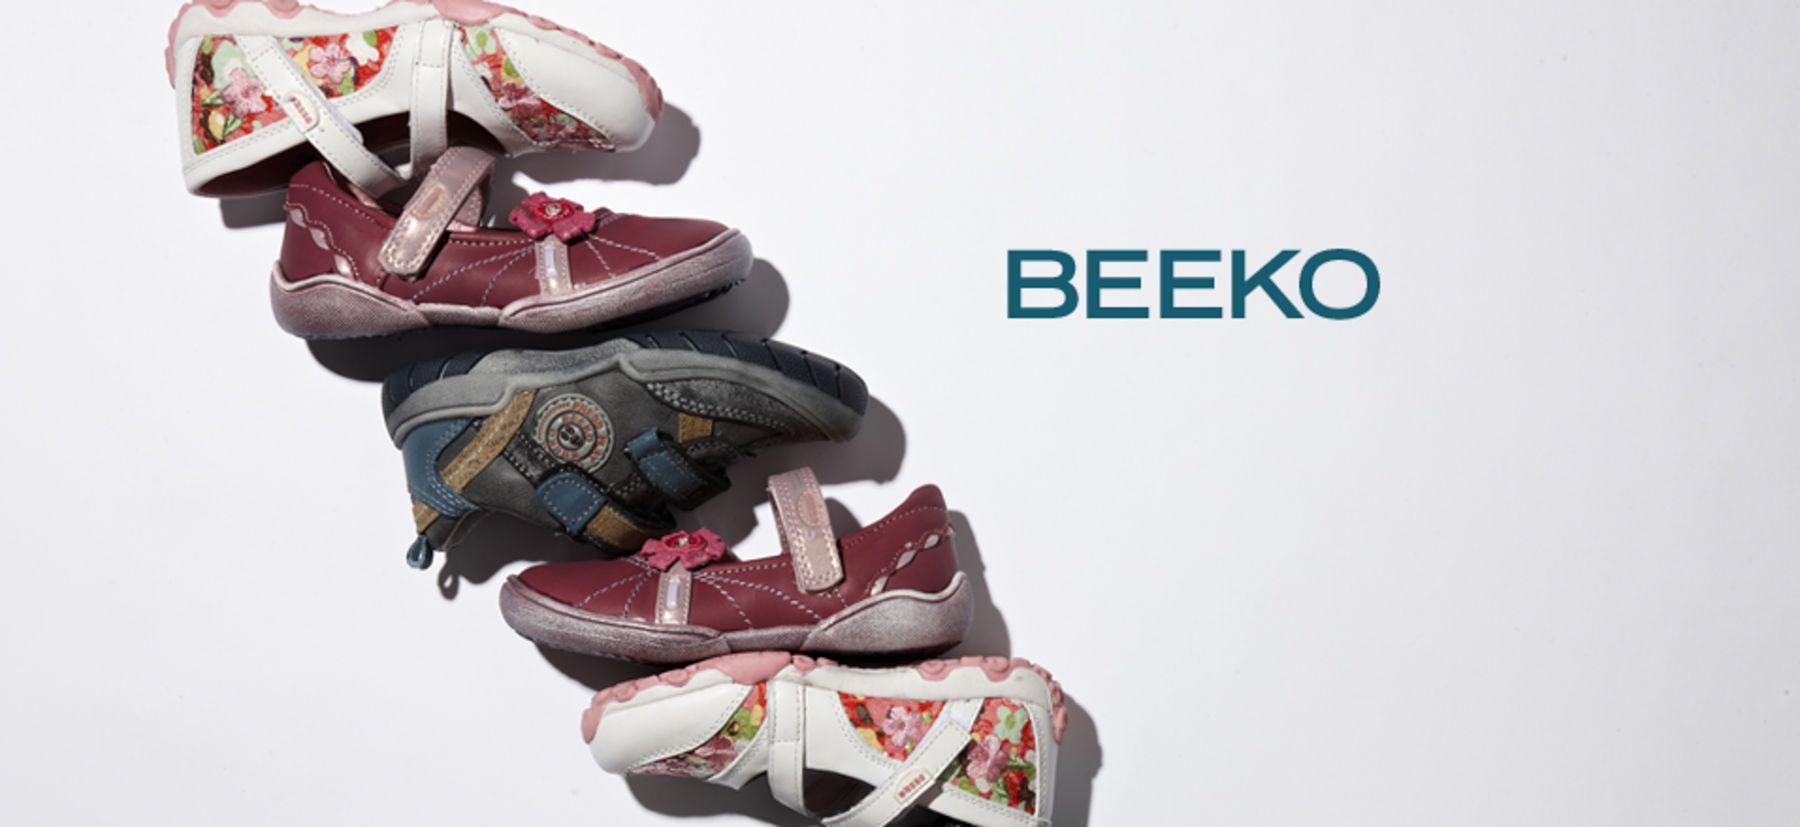 1beeko_1.jpg